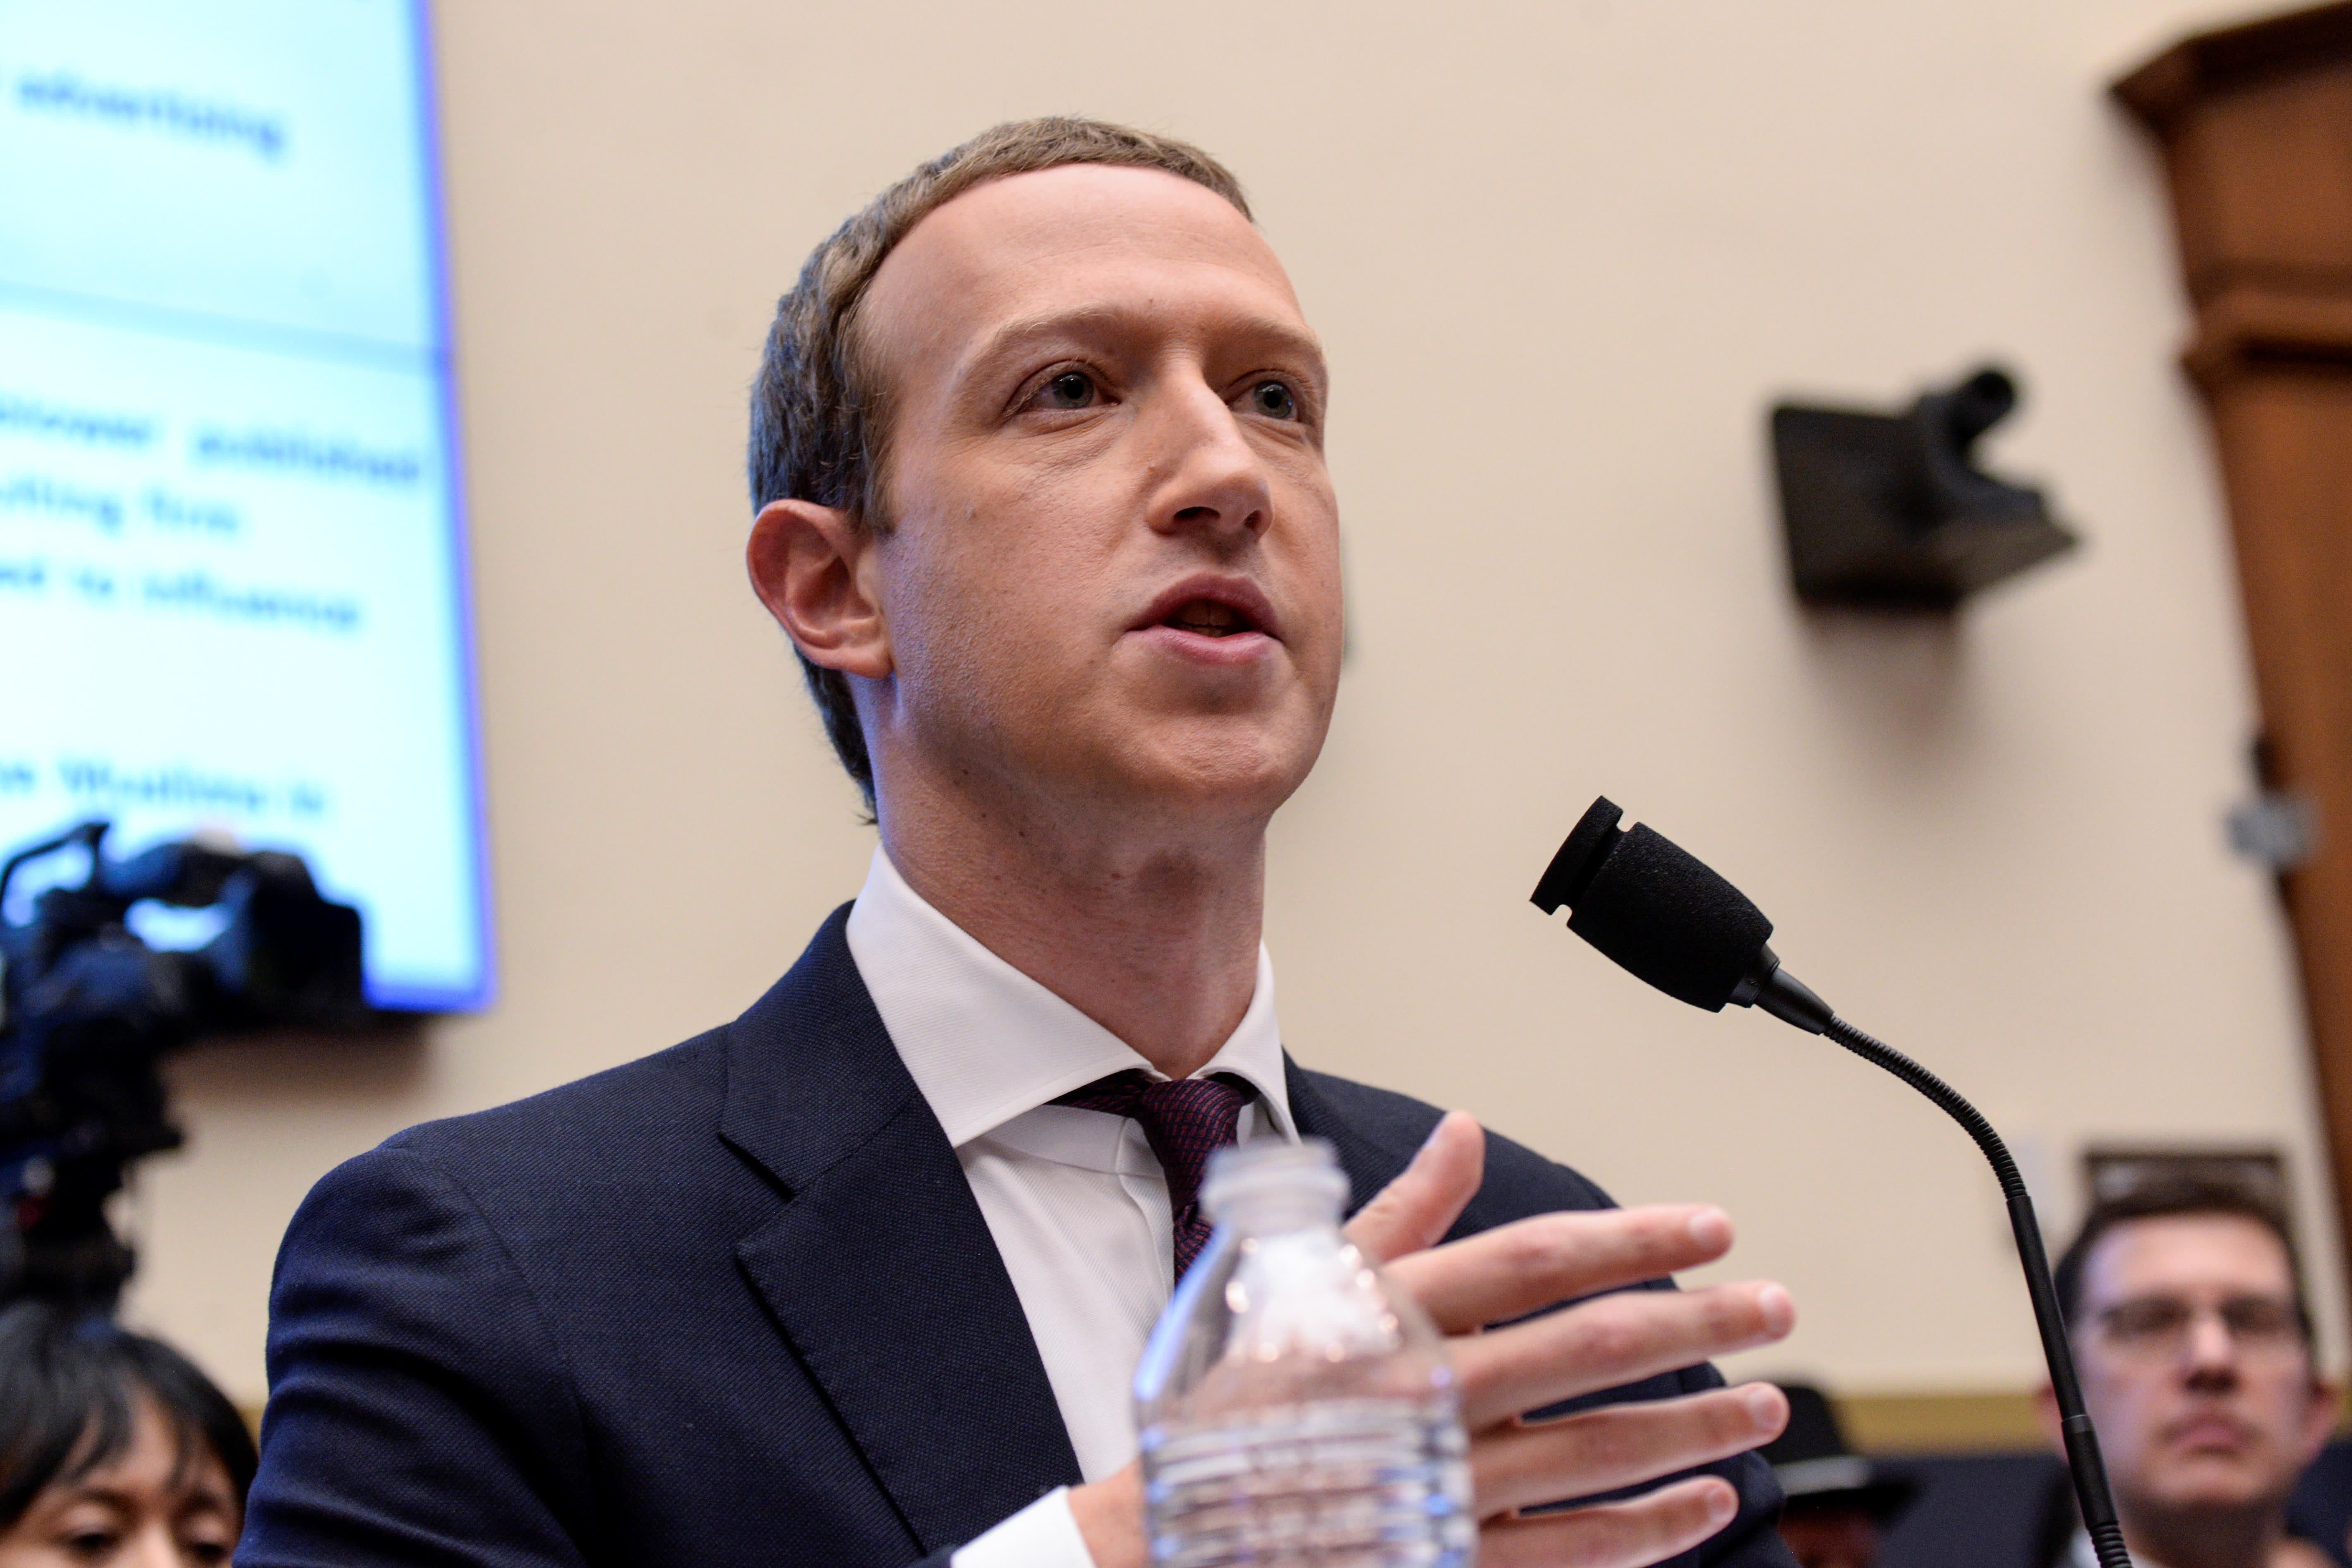 Wall Street seems to like Mark Zuckerberg's testimony, as Facebook shares rise